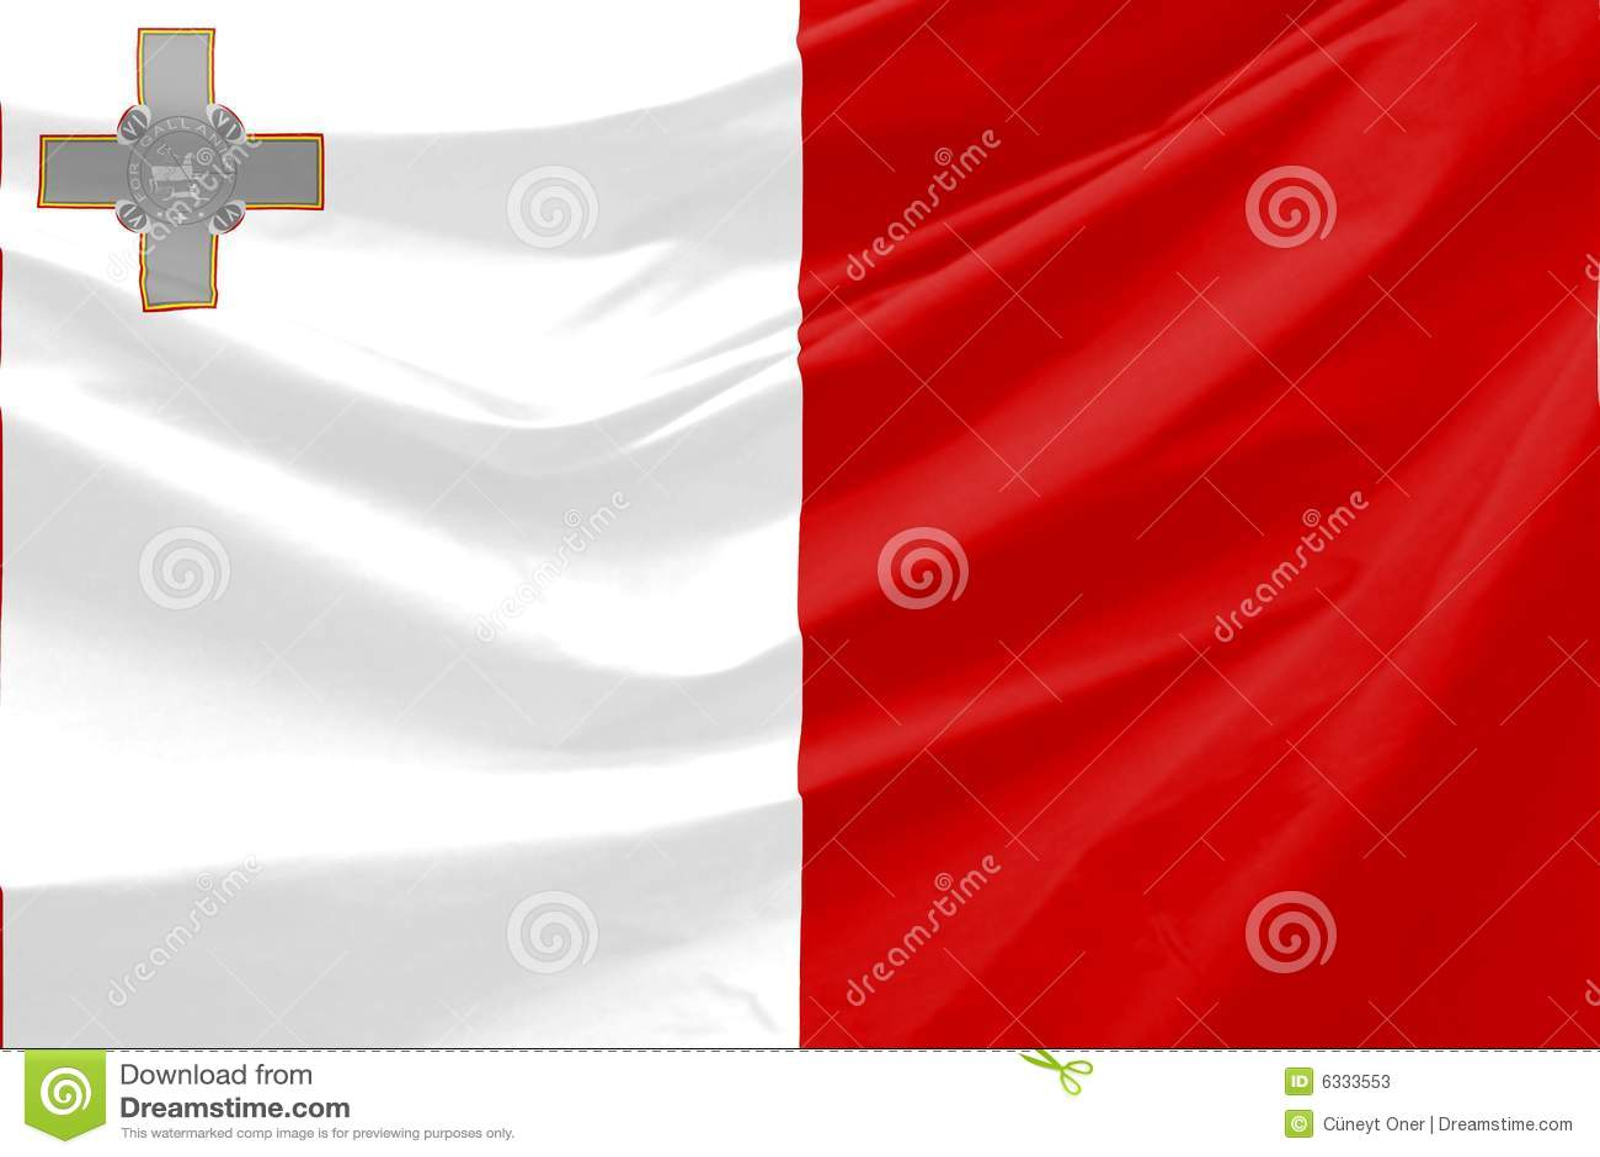 Indicateur de Malte